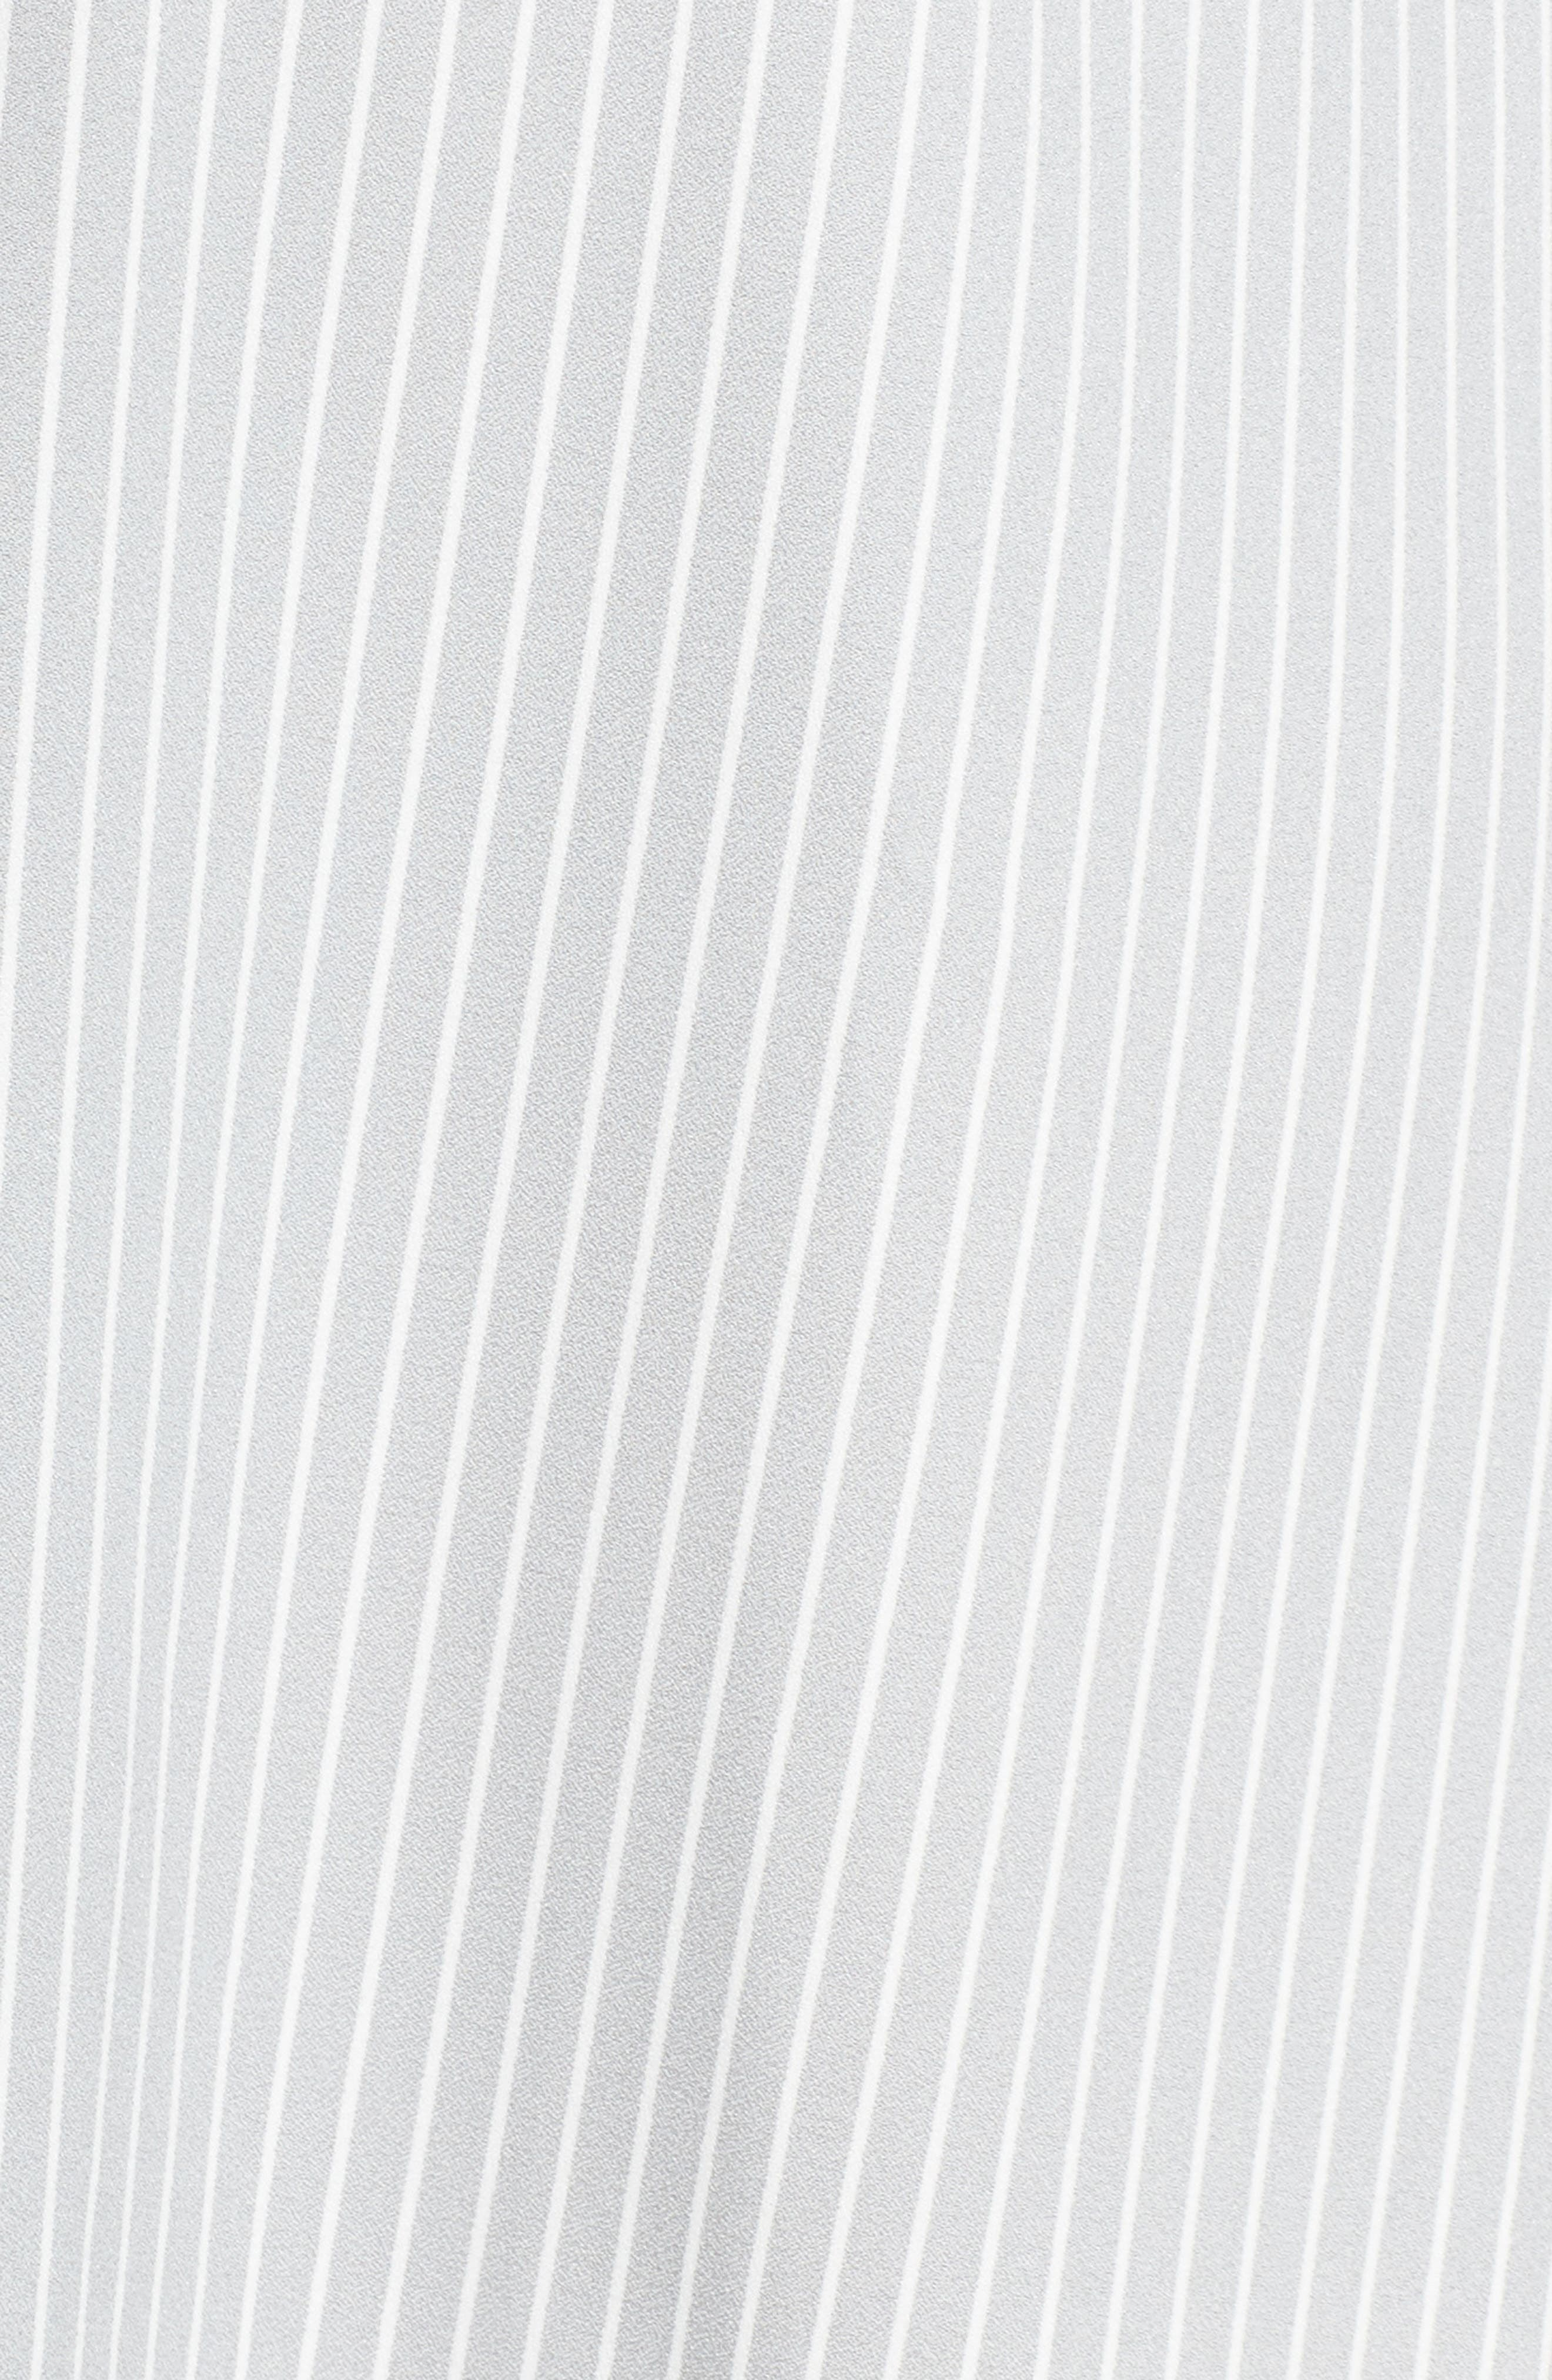 Check Ruffle Stripe Dress,                             Alternate thumbnail 6, color,                             Grey